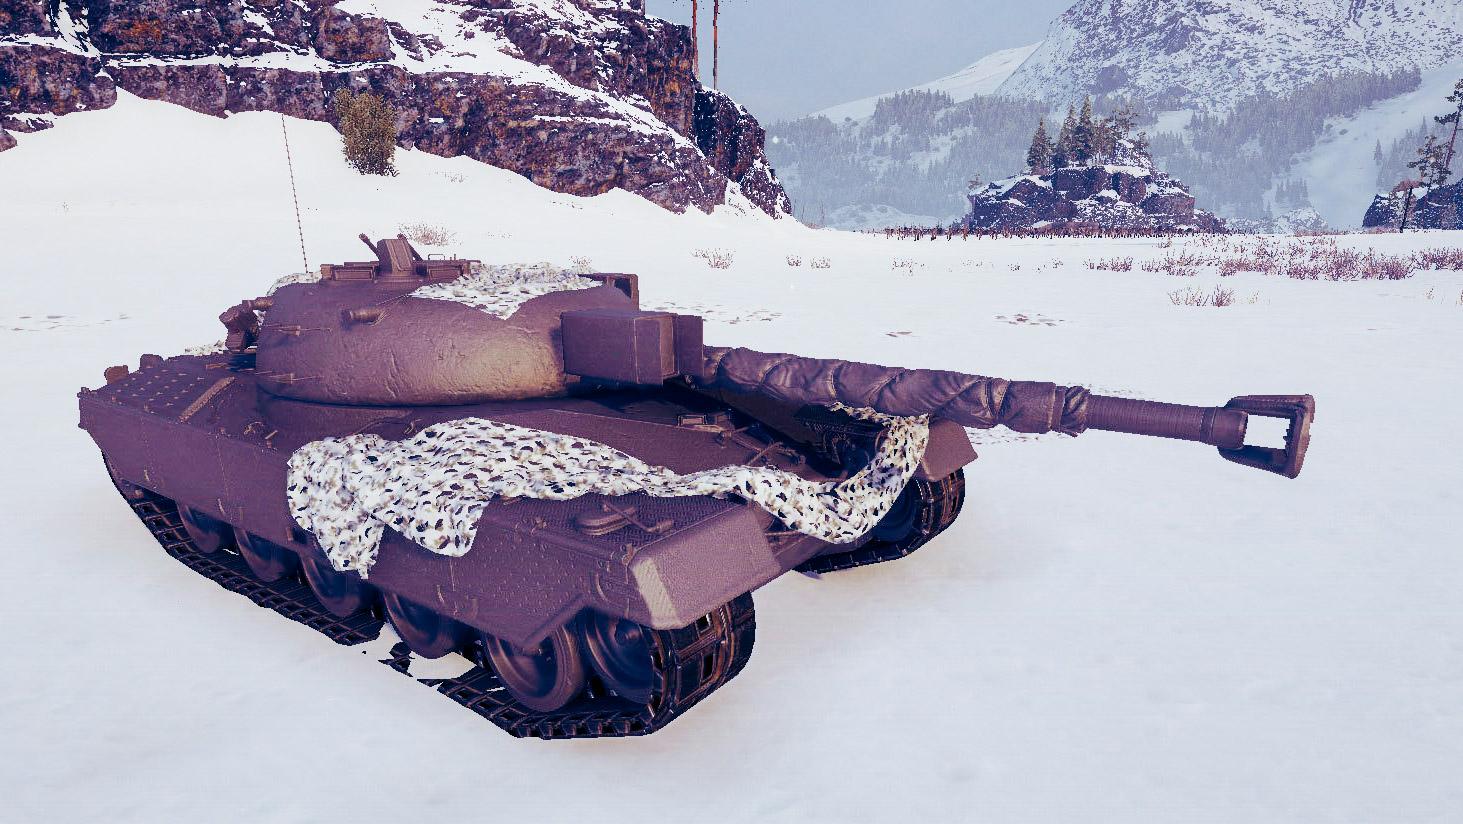 Kampfpanzer 50 t — главная награда за Ранговые бои в 2019 году